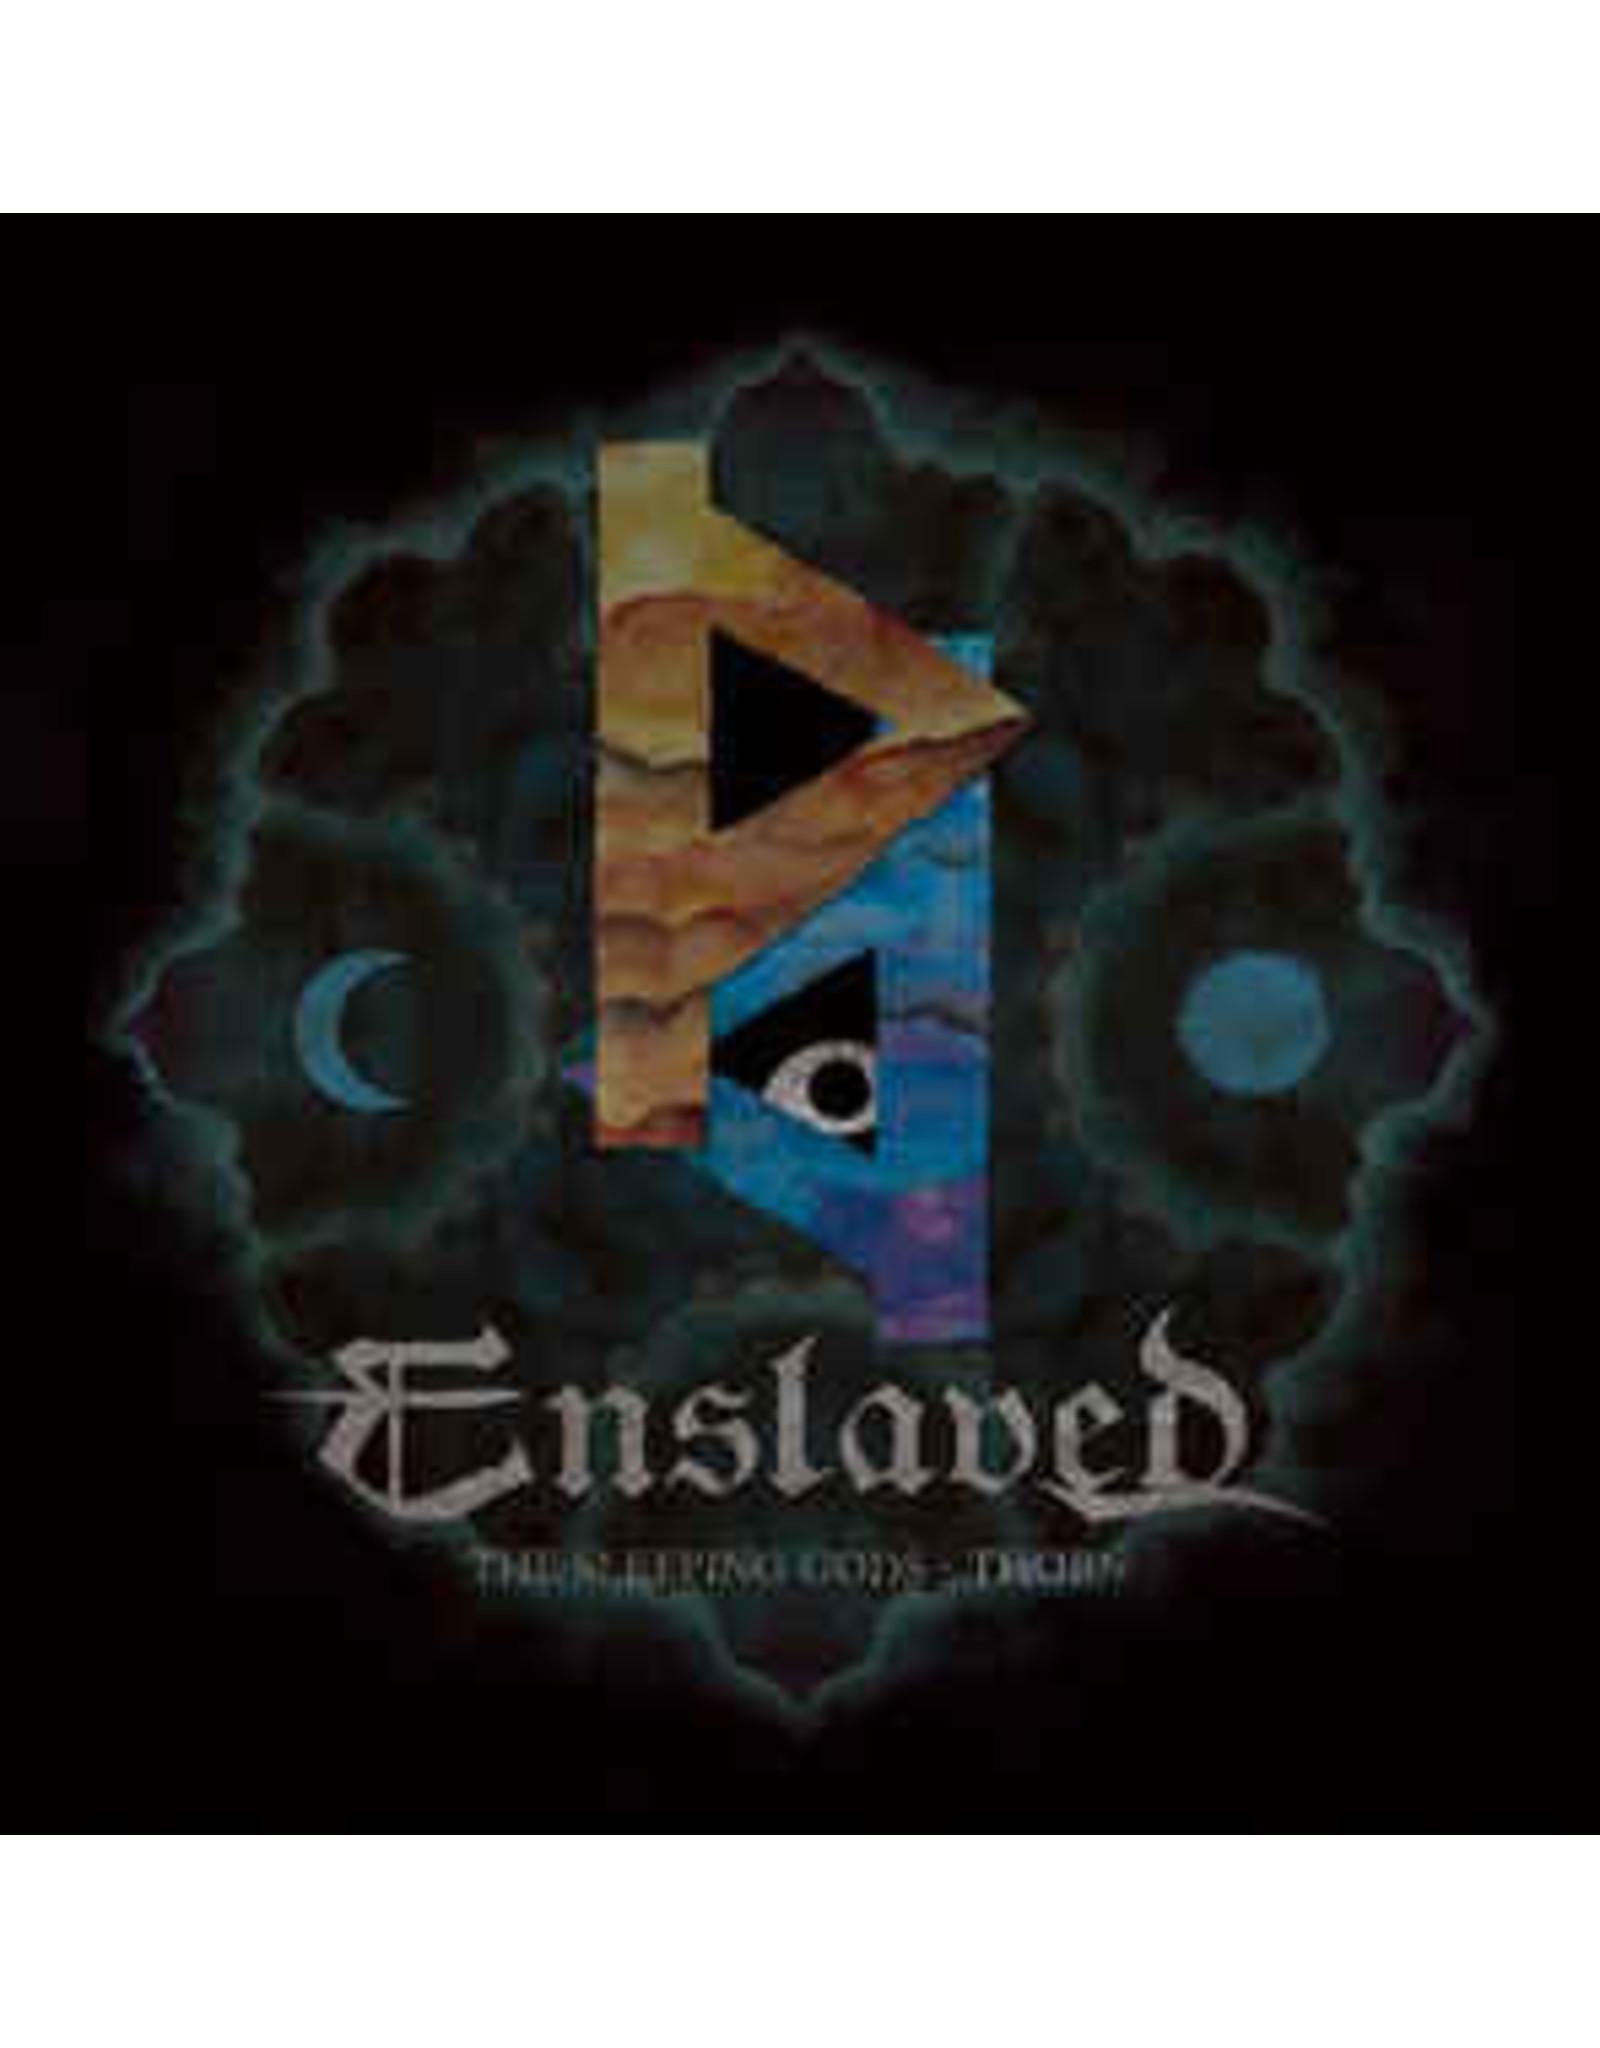 Enslaved - Sleeping Gods Thorn LP